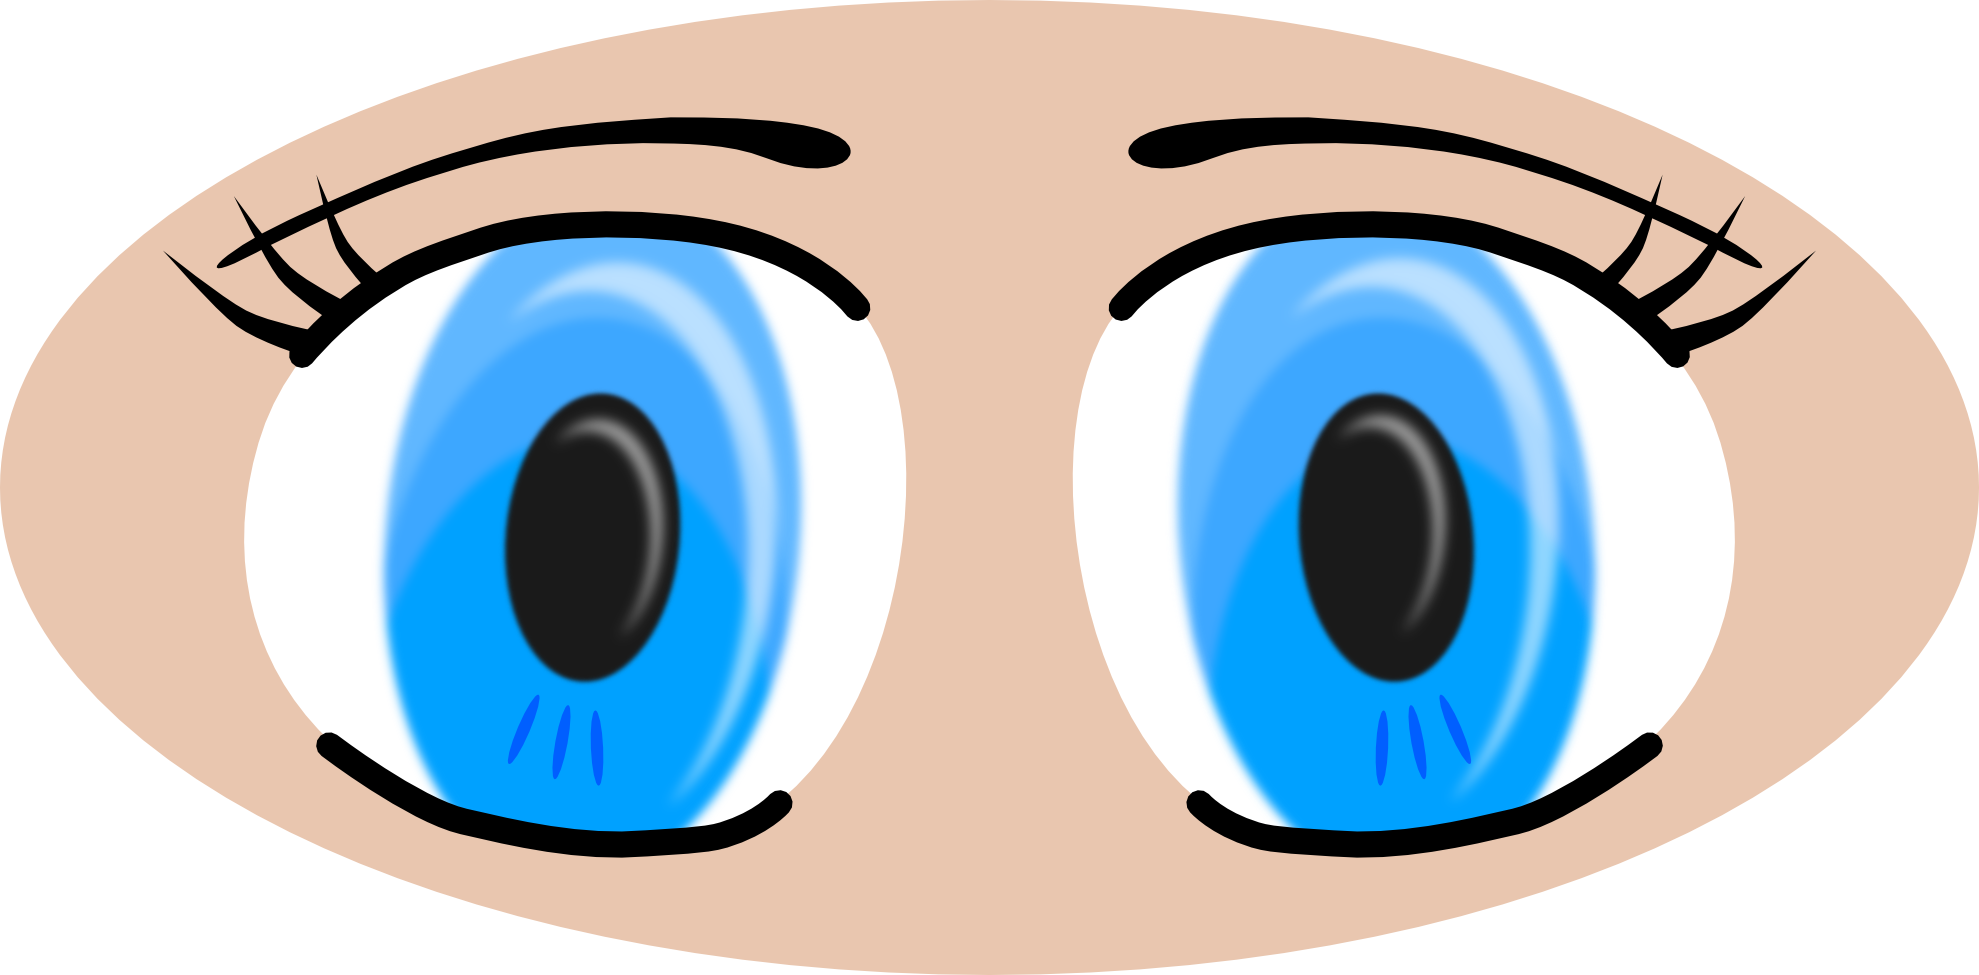 Eyes eye clipart 1 image